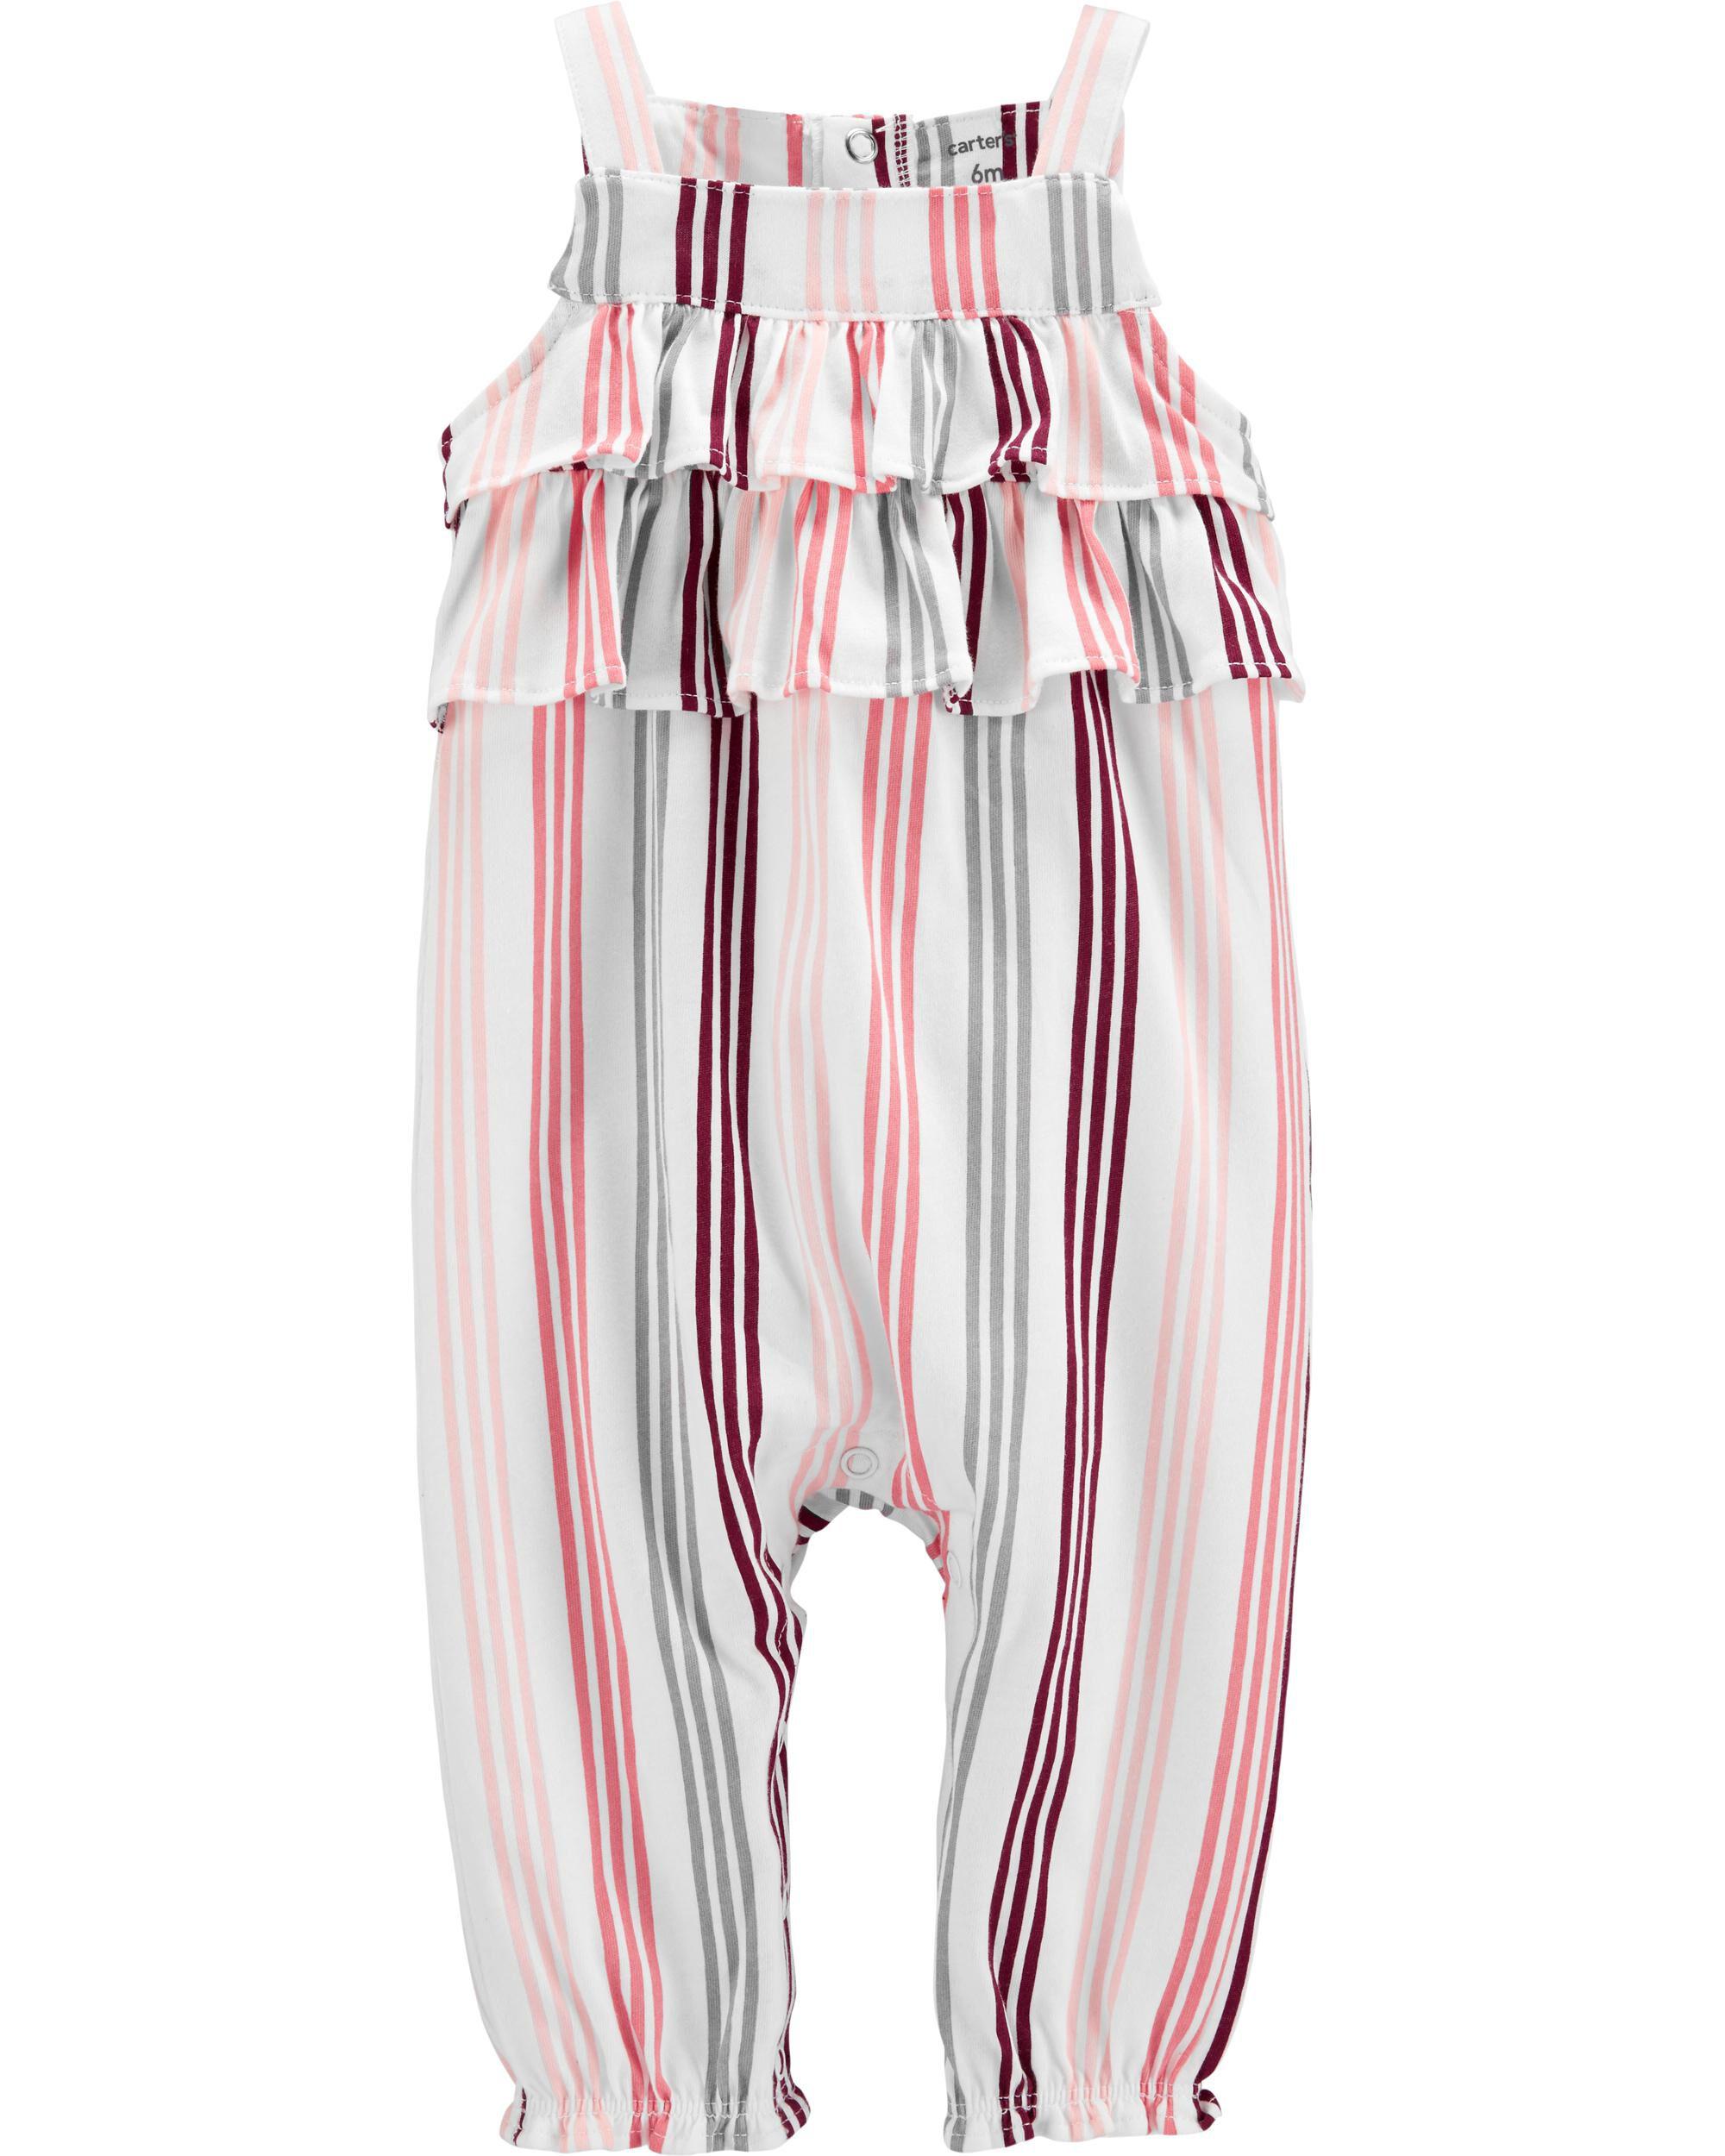 Carters Baby Girl Striped Ruffle Romper